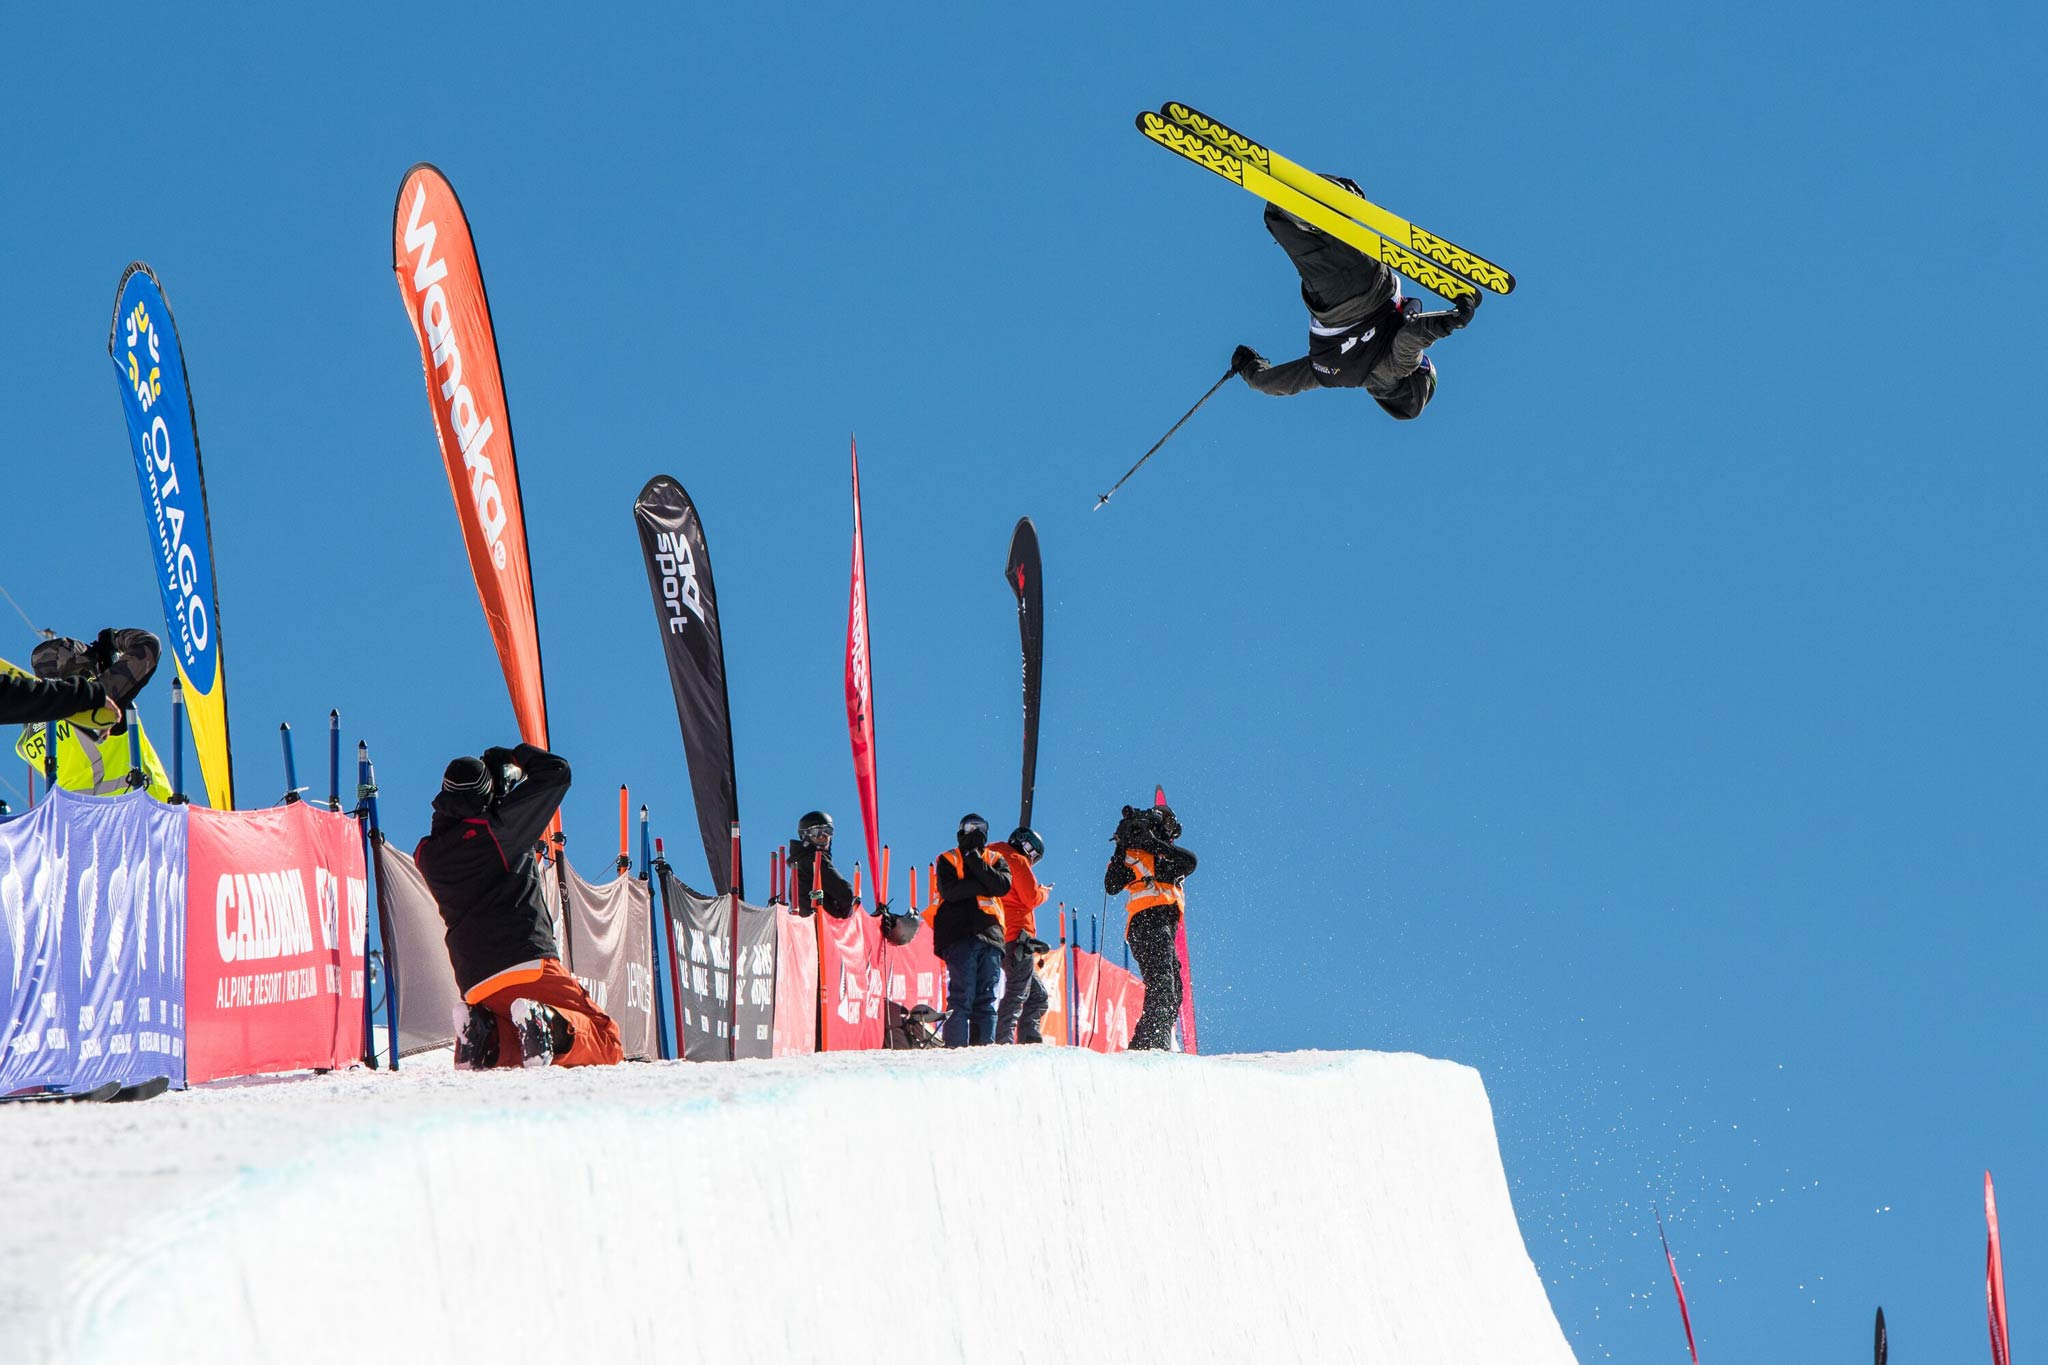 Der Gewinner bei den Männern: Birk Irving aus den USA - Foto: FIS Freestyle / Jason Kerr